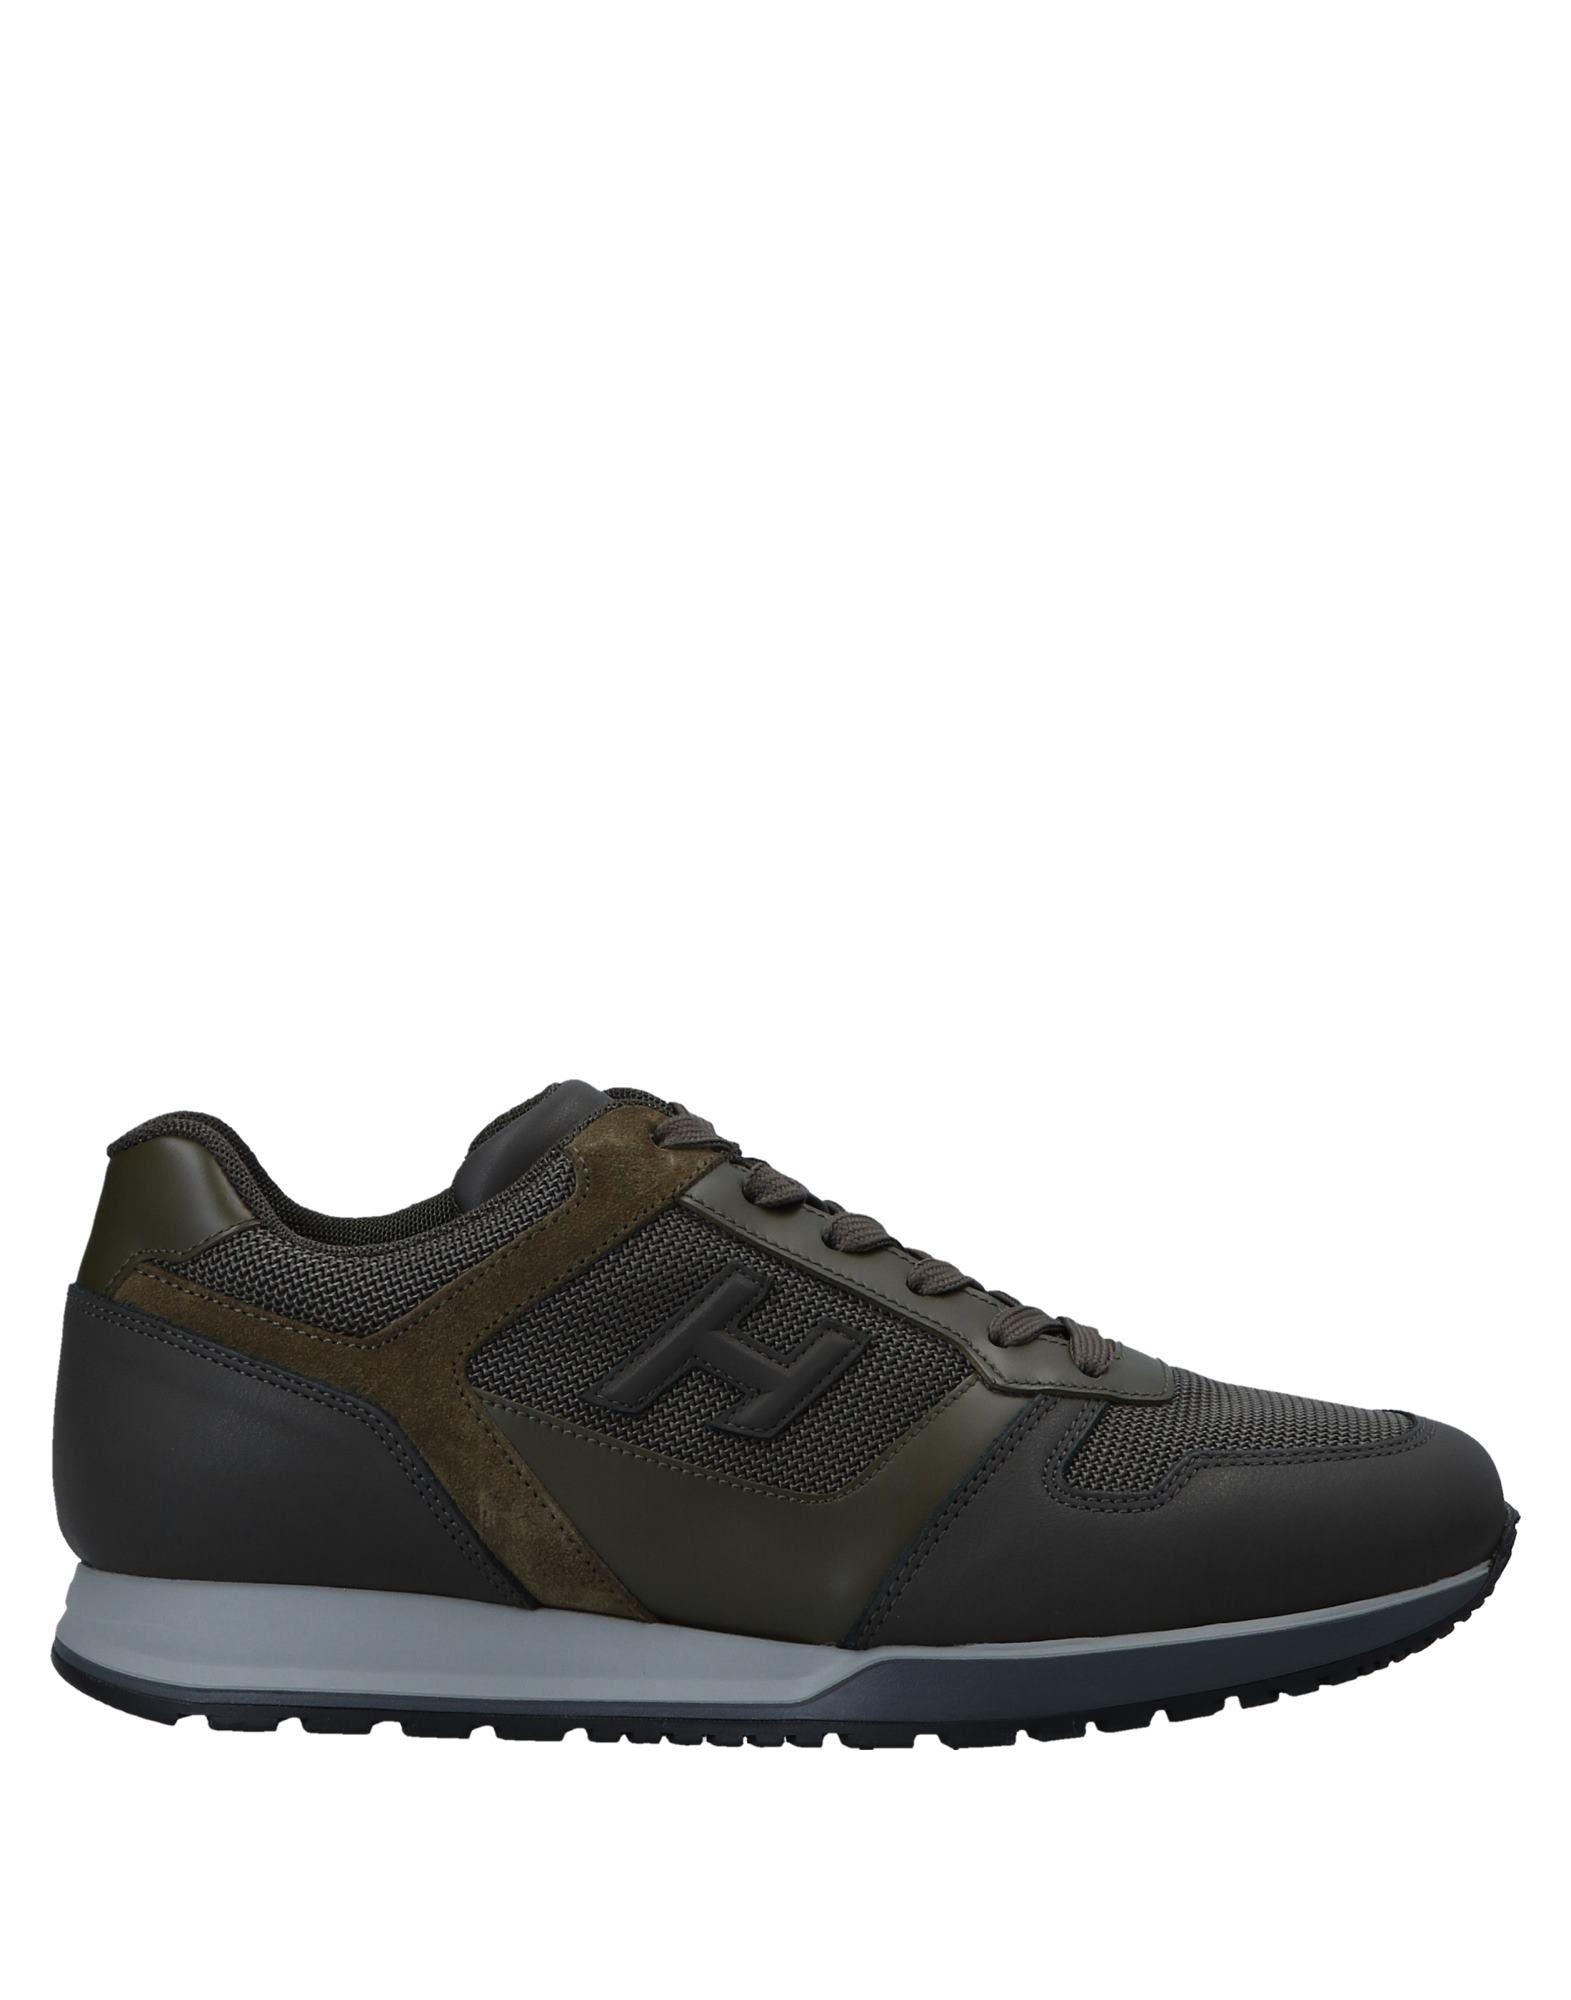 Hogan Sneakers Herren beliebte  11559785VD Gute Qualität beliebte Herren Schuhe d48e27